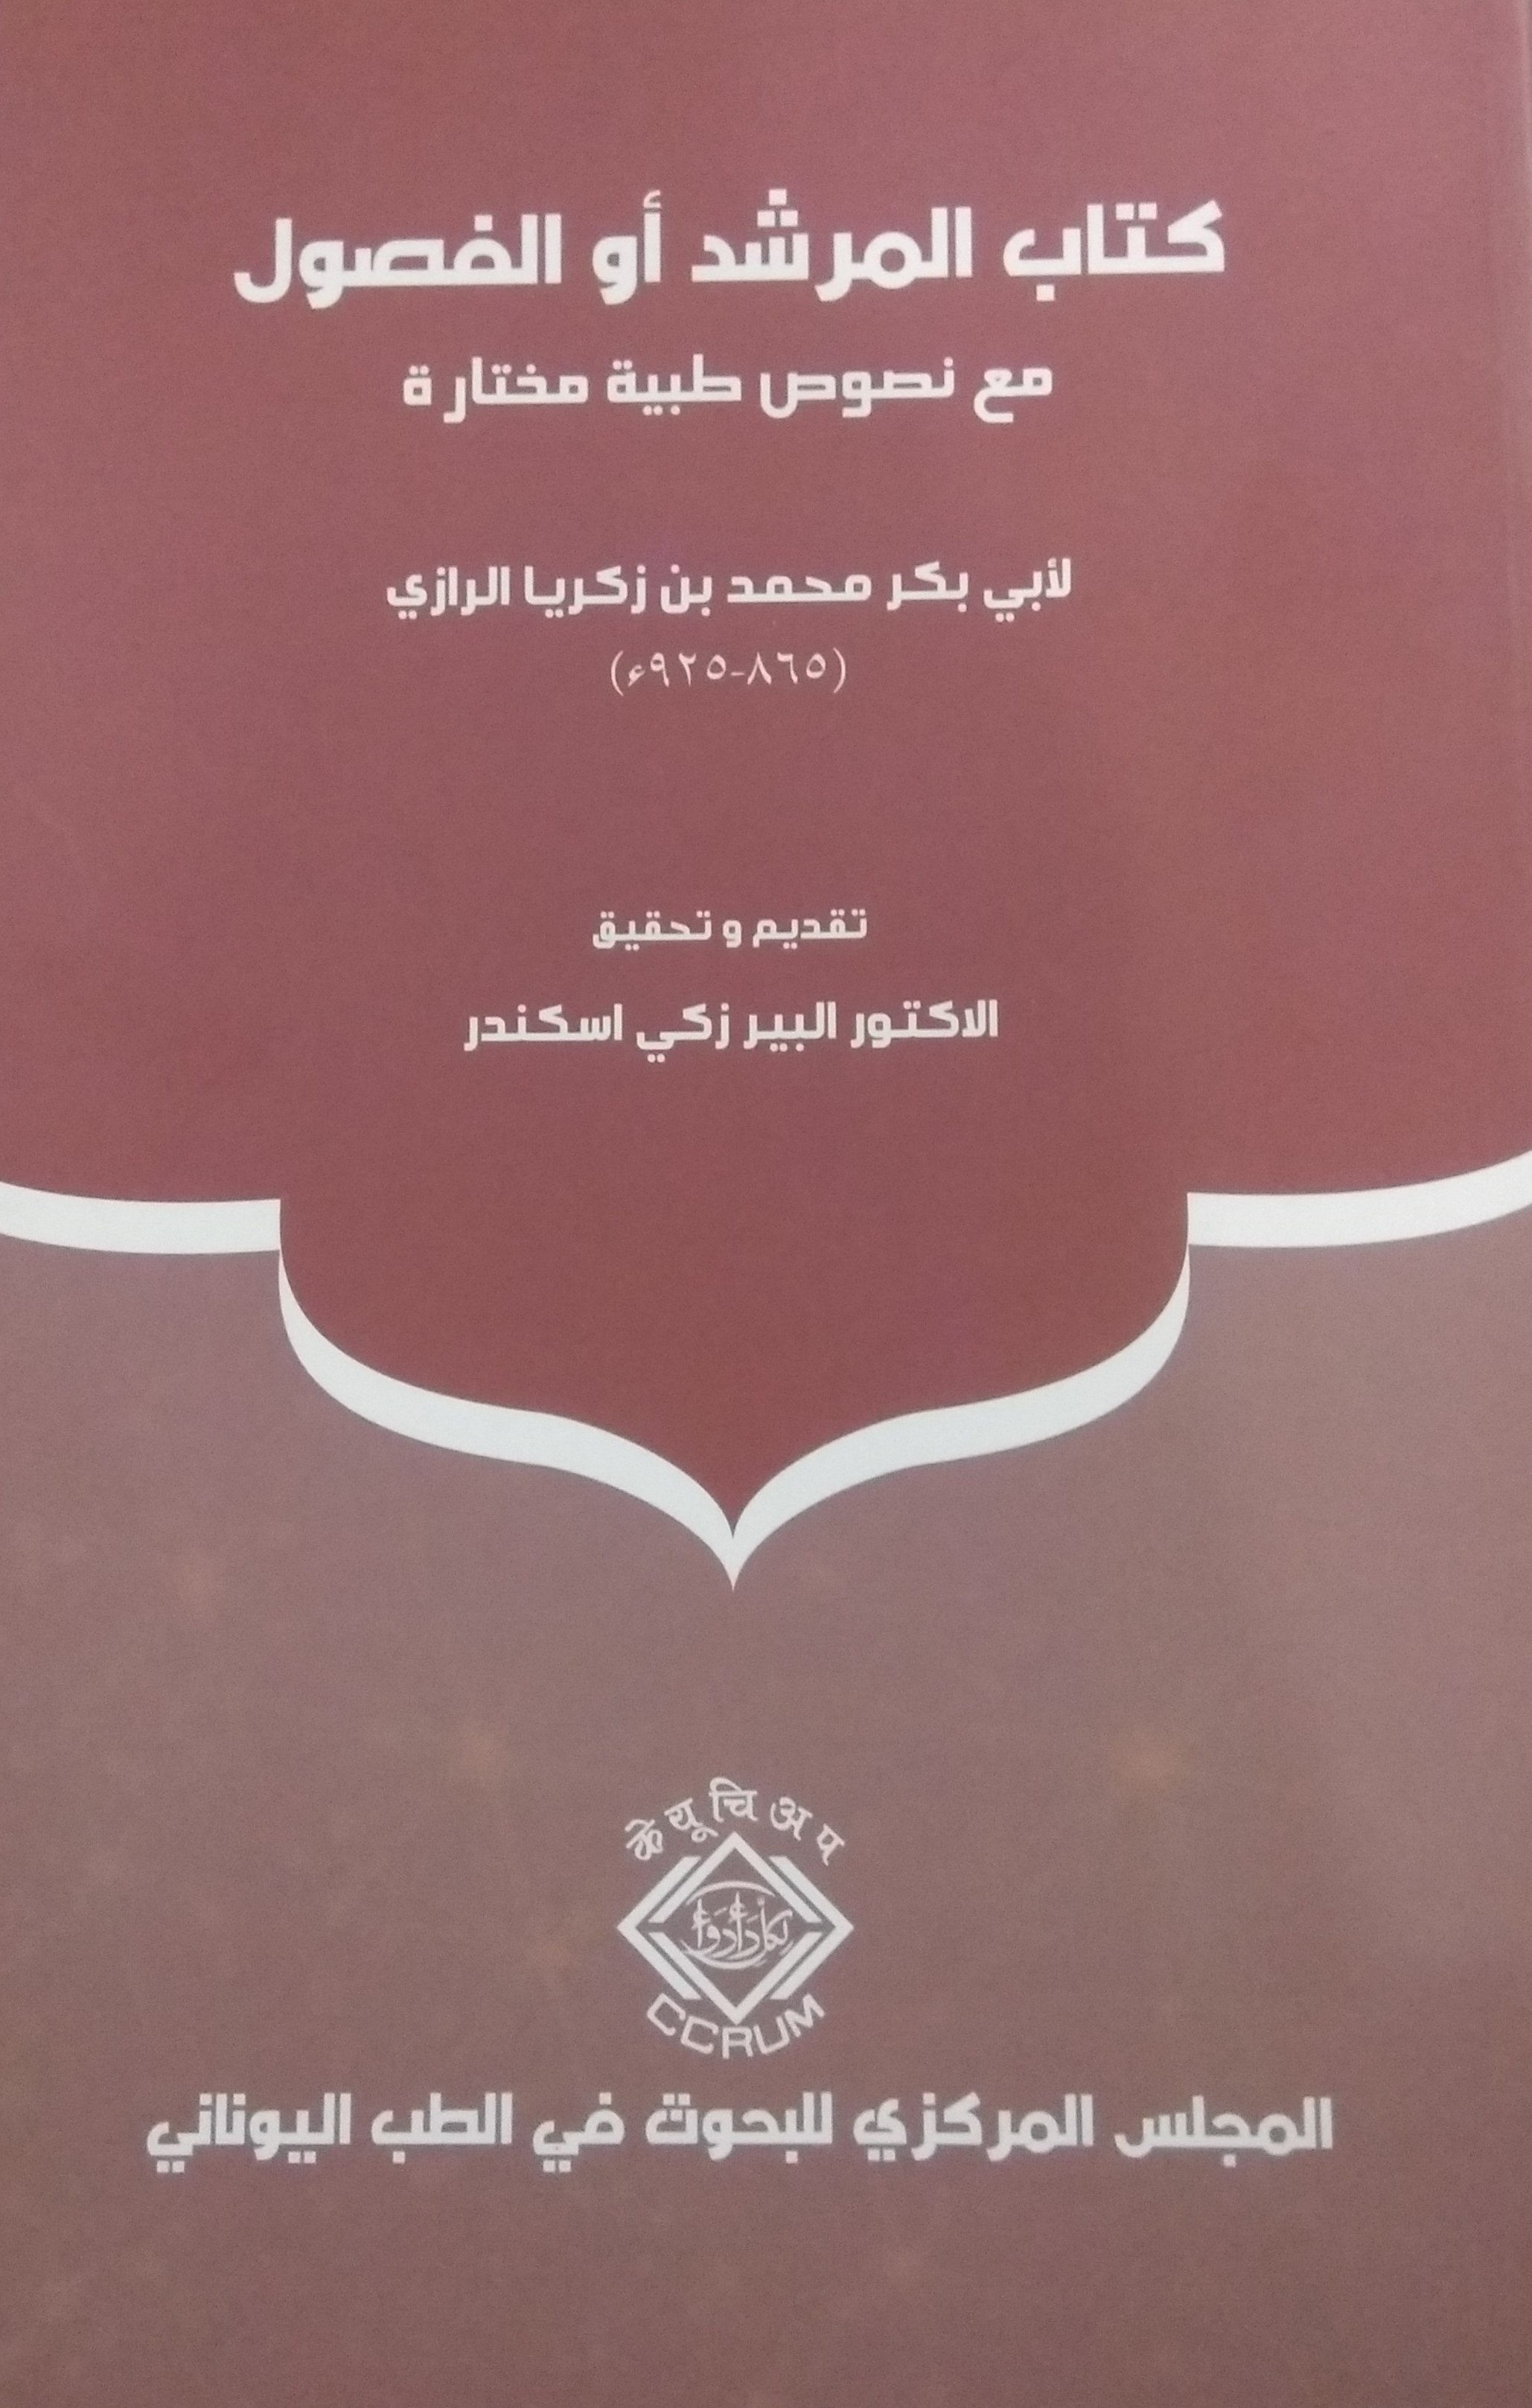 Kitab al-Murshid aw al-Fusul (Urdu)